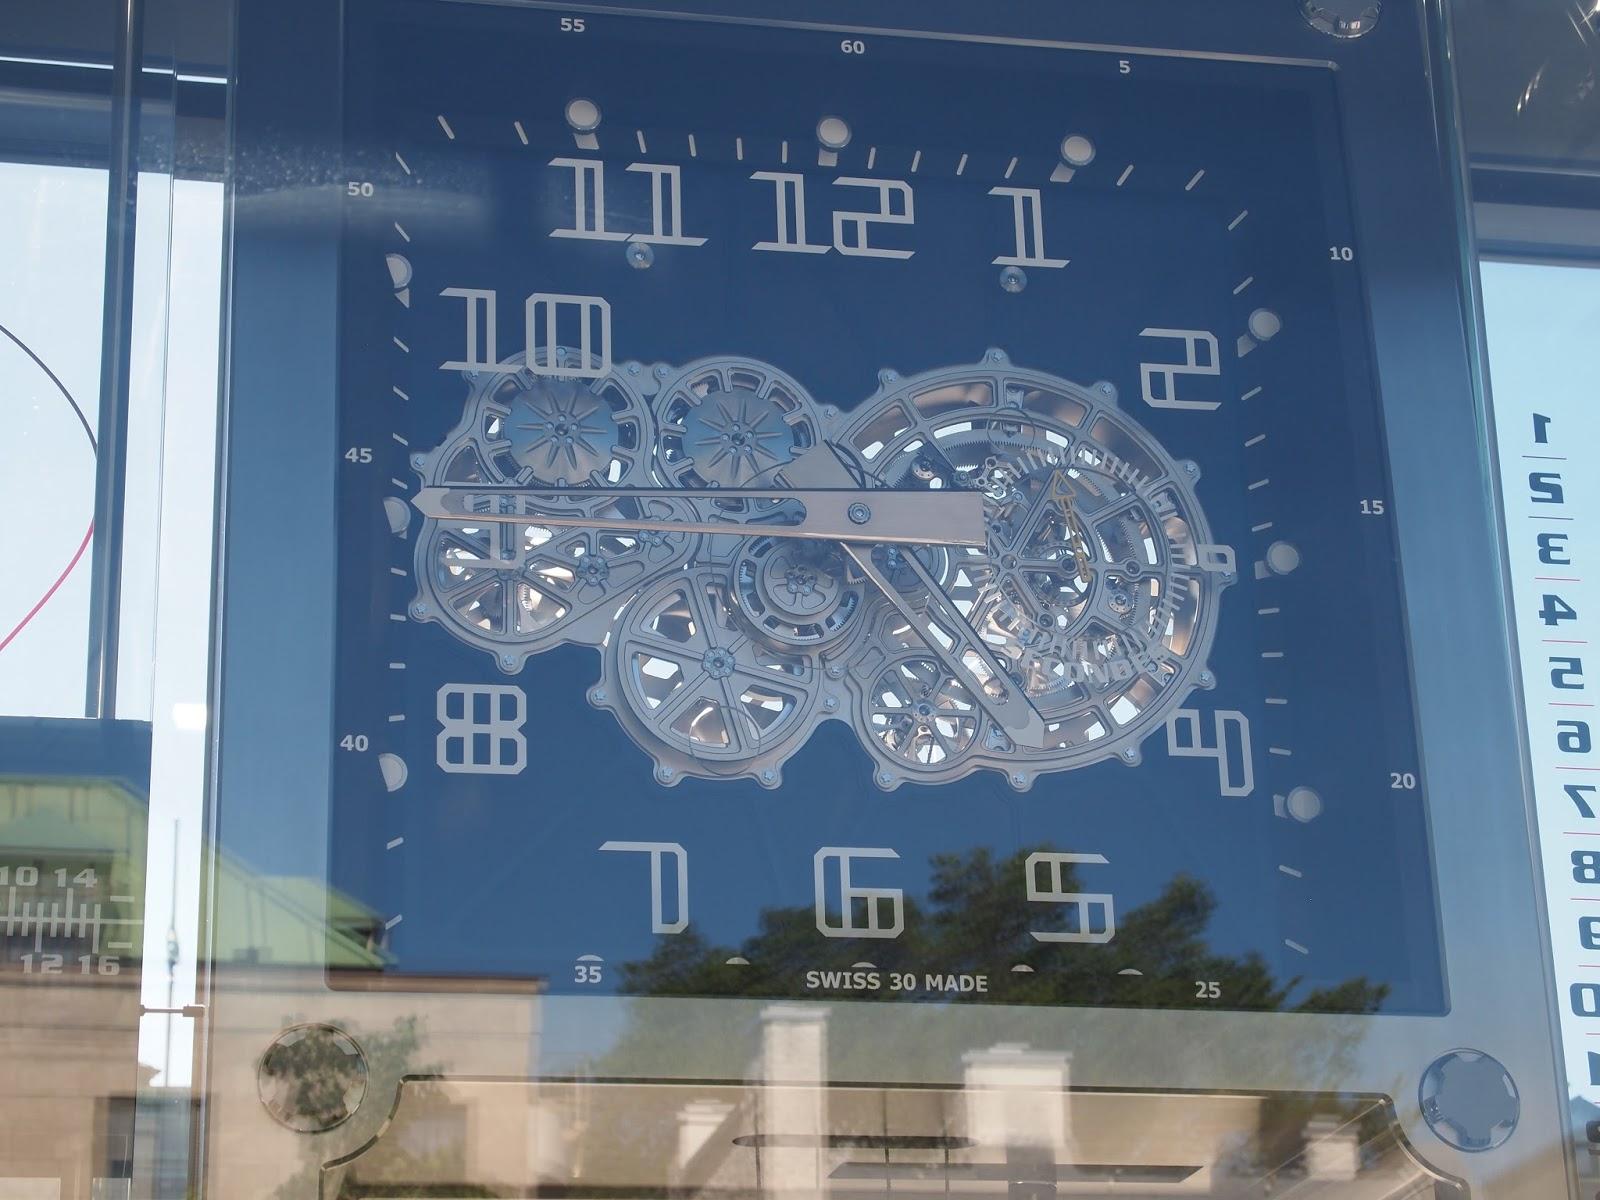 Number 16 Amazing Swiss clock in Quebec City